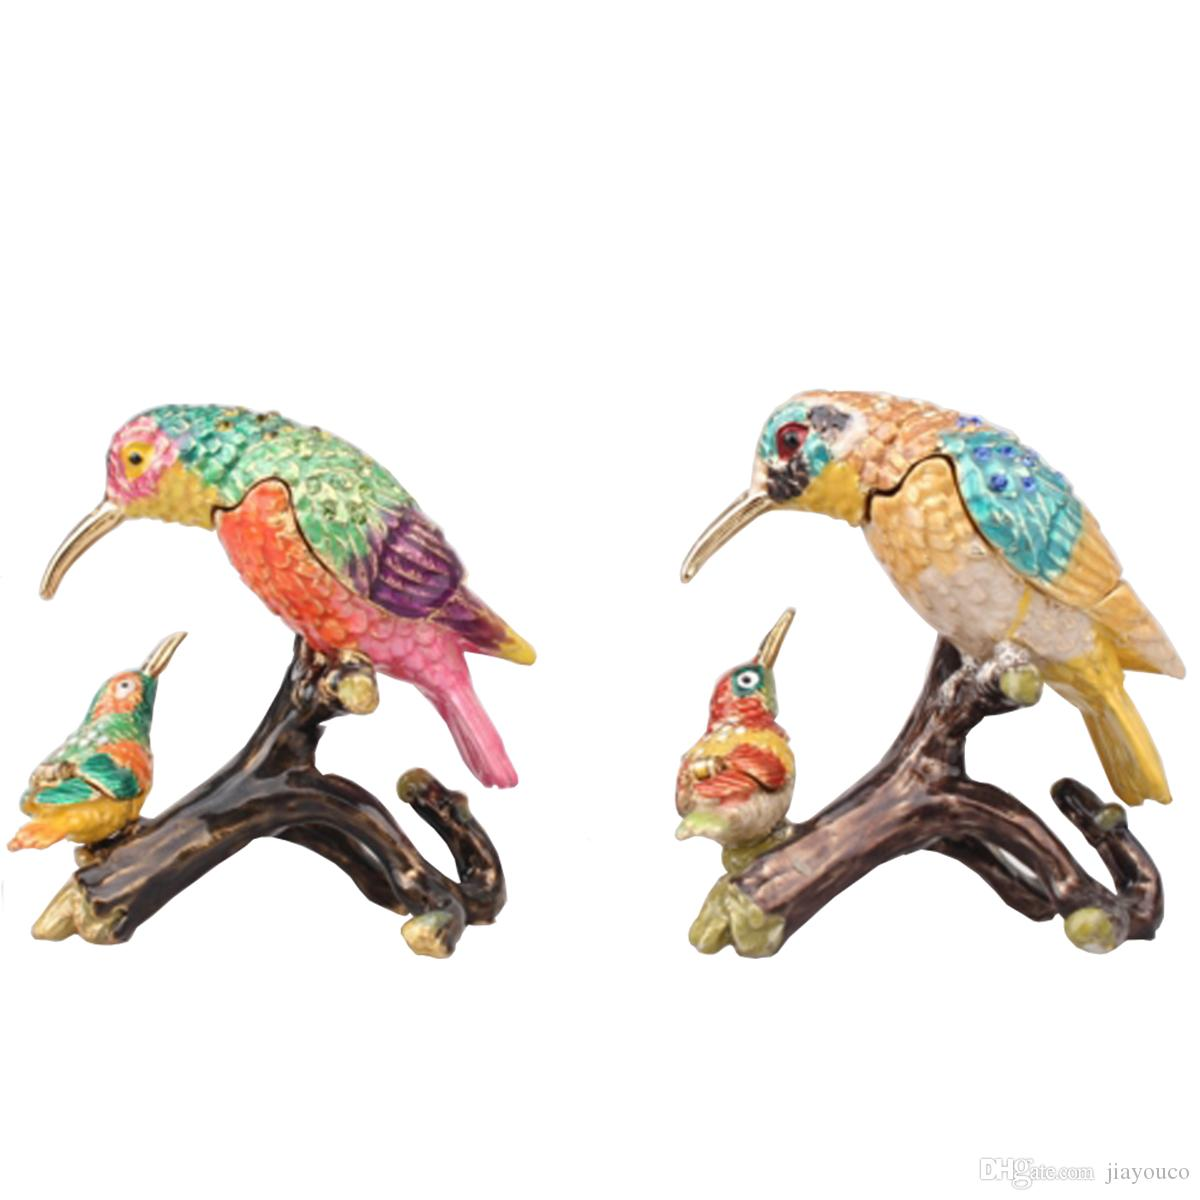 Faberge Bird Bejeweled Trinket Box Crystal Jewelry Box voor Ring Metal Home Decor Verjaardagscadeau Collectibles Harned Keepsake Box